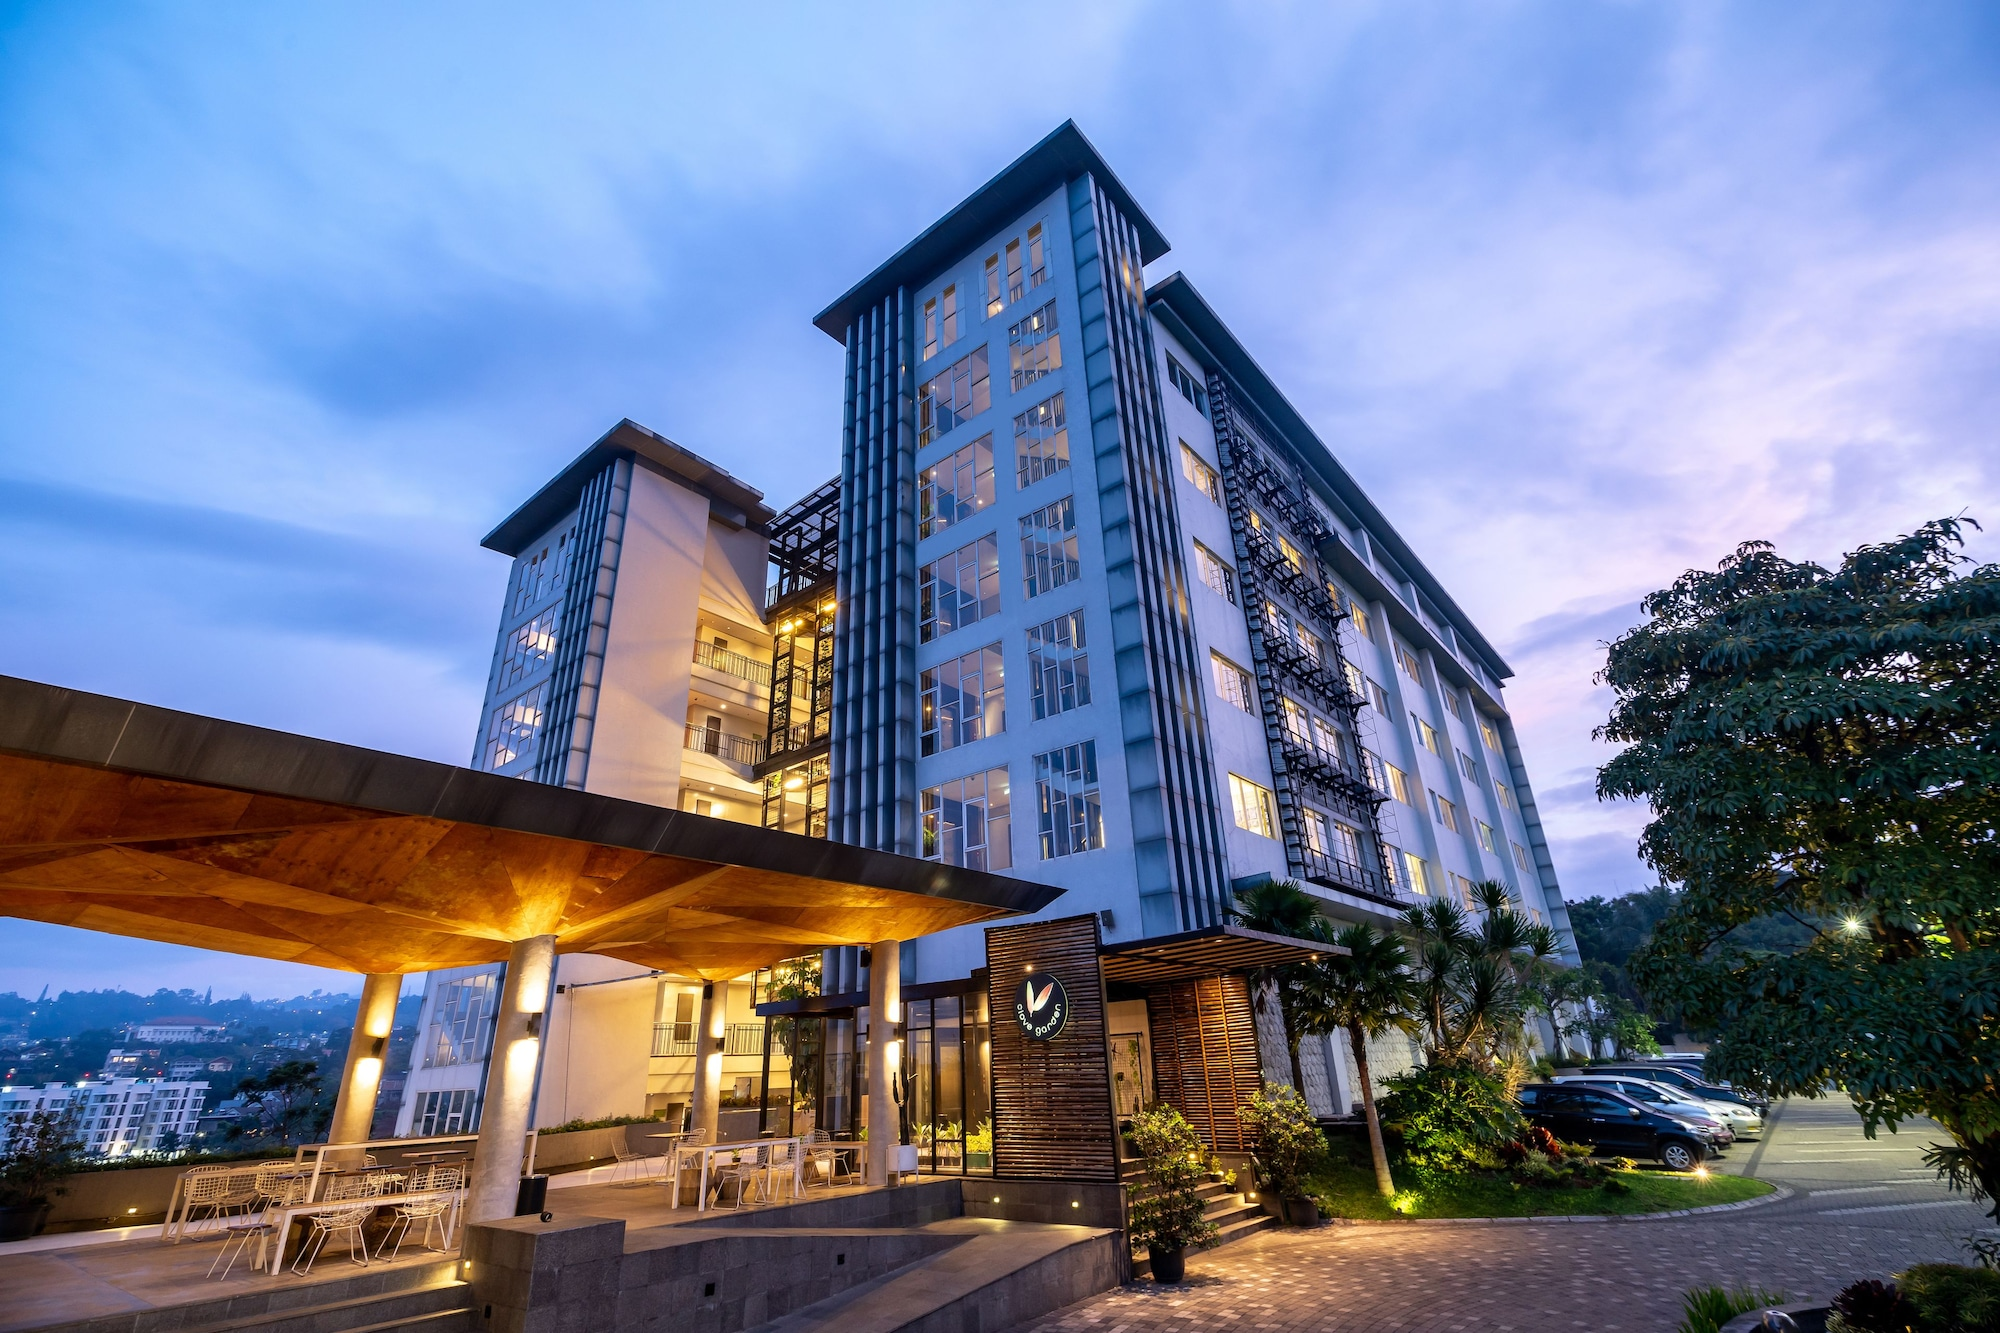 Clove Garden Hotel and Residence, Bandung